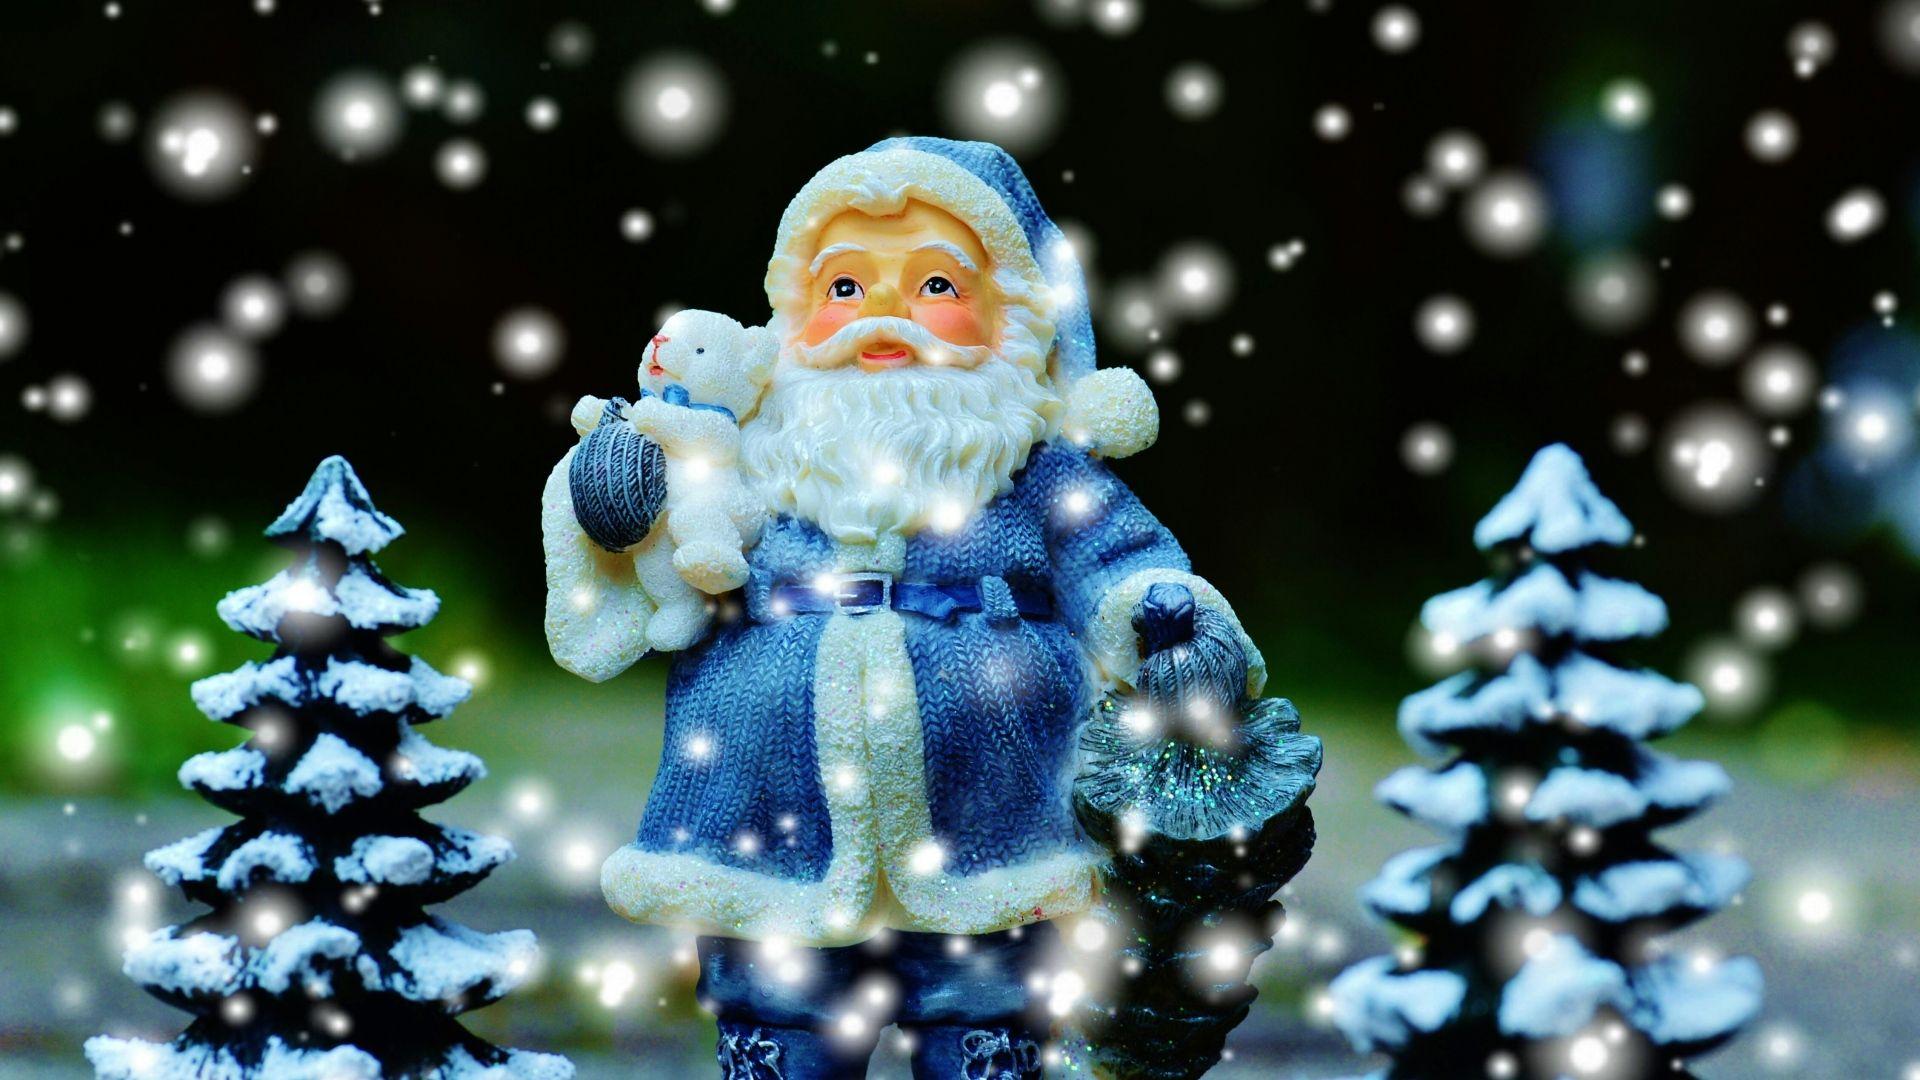 1920x1080 wallpaper santa claus christmas trees new year christmas